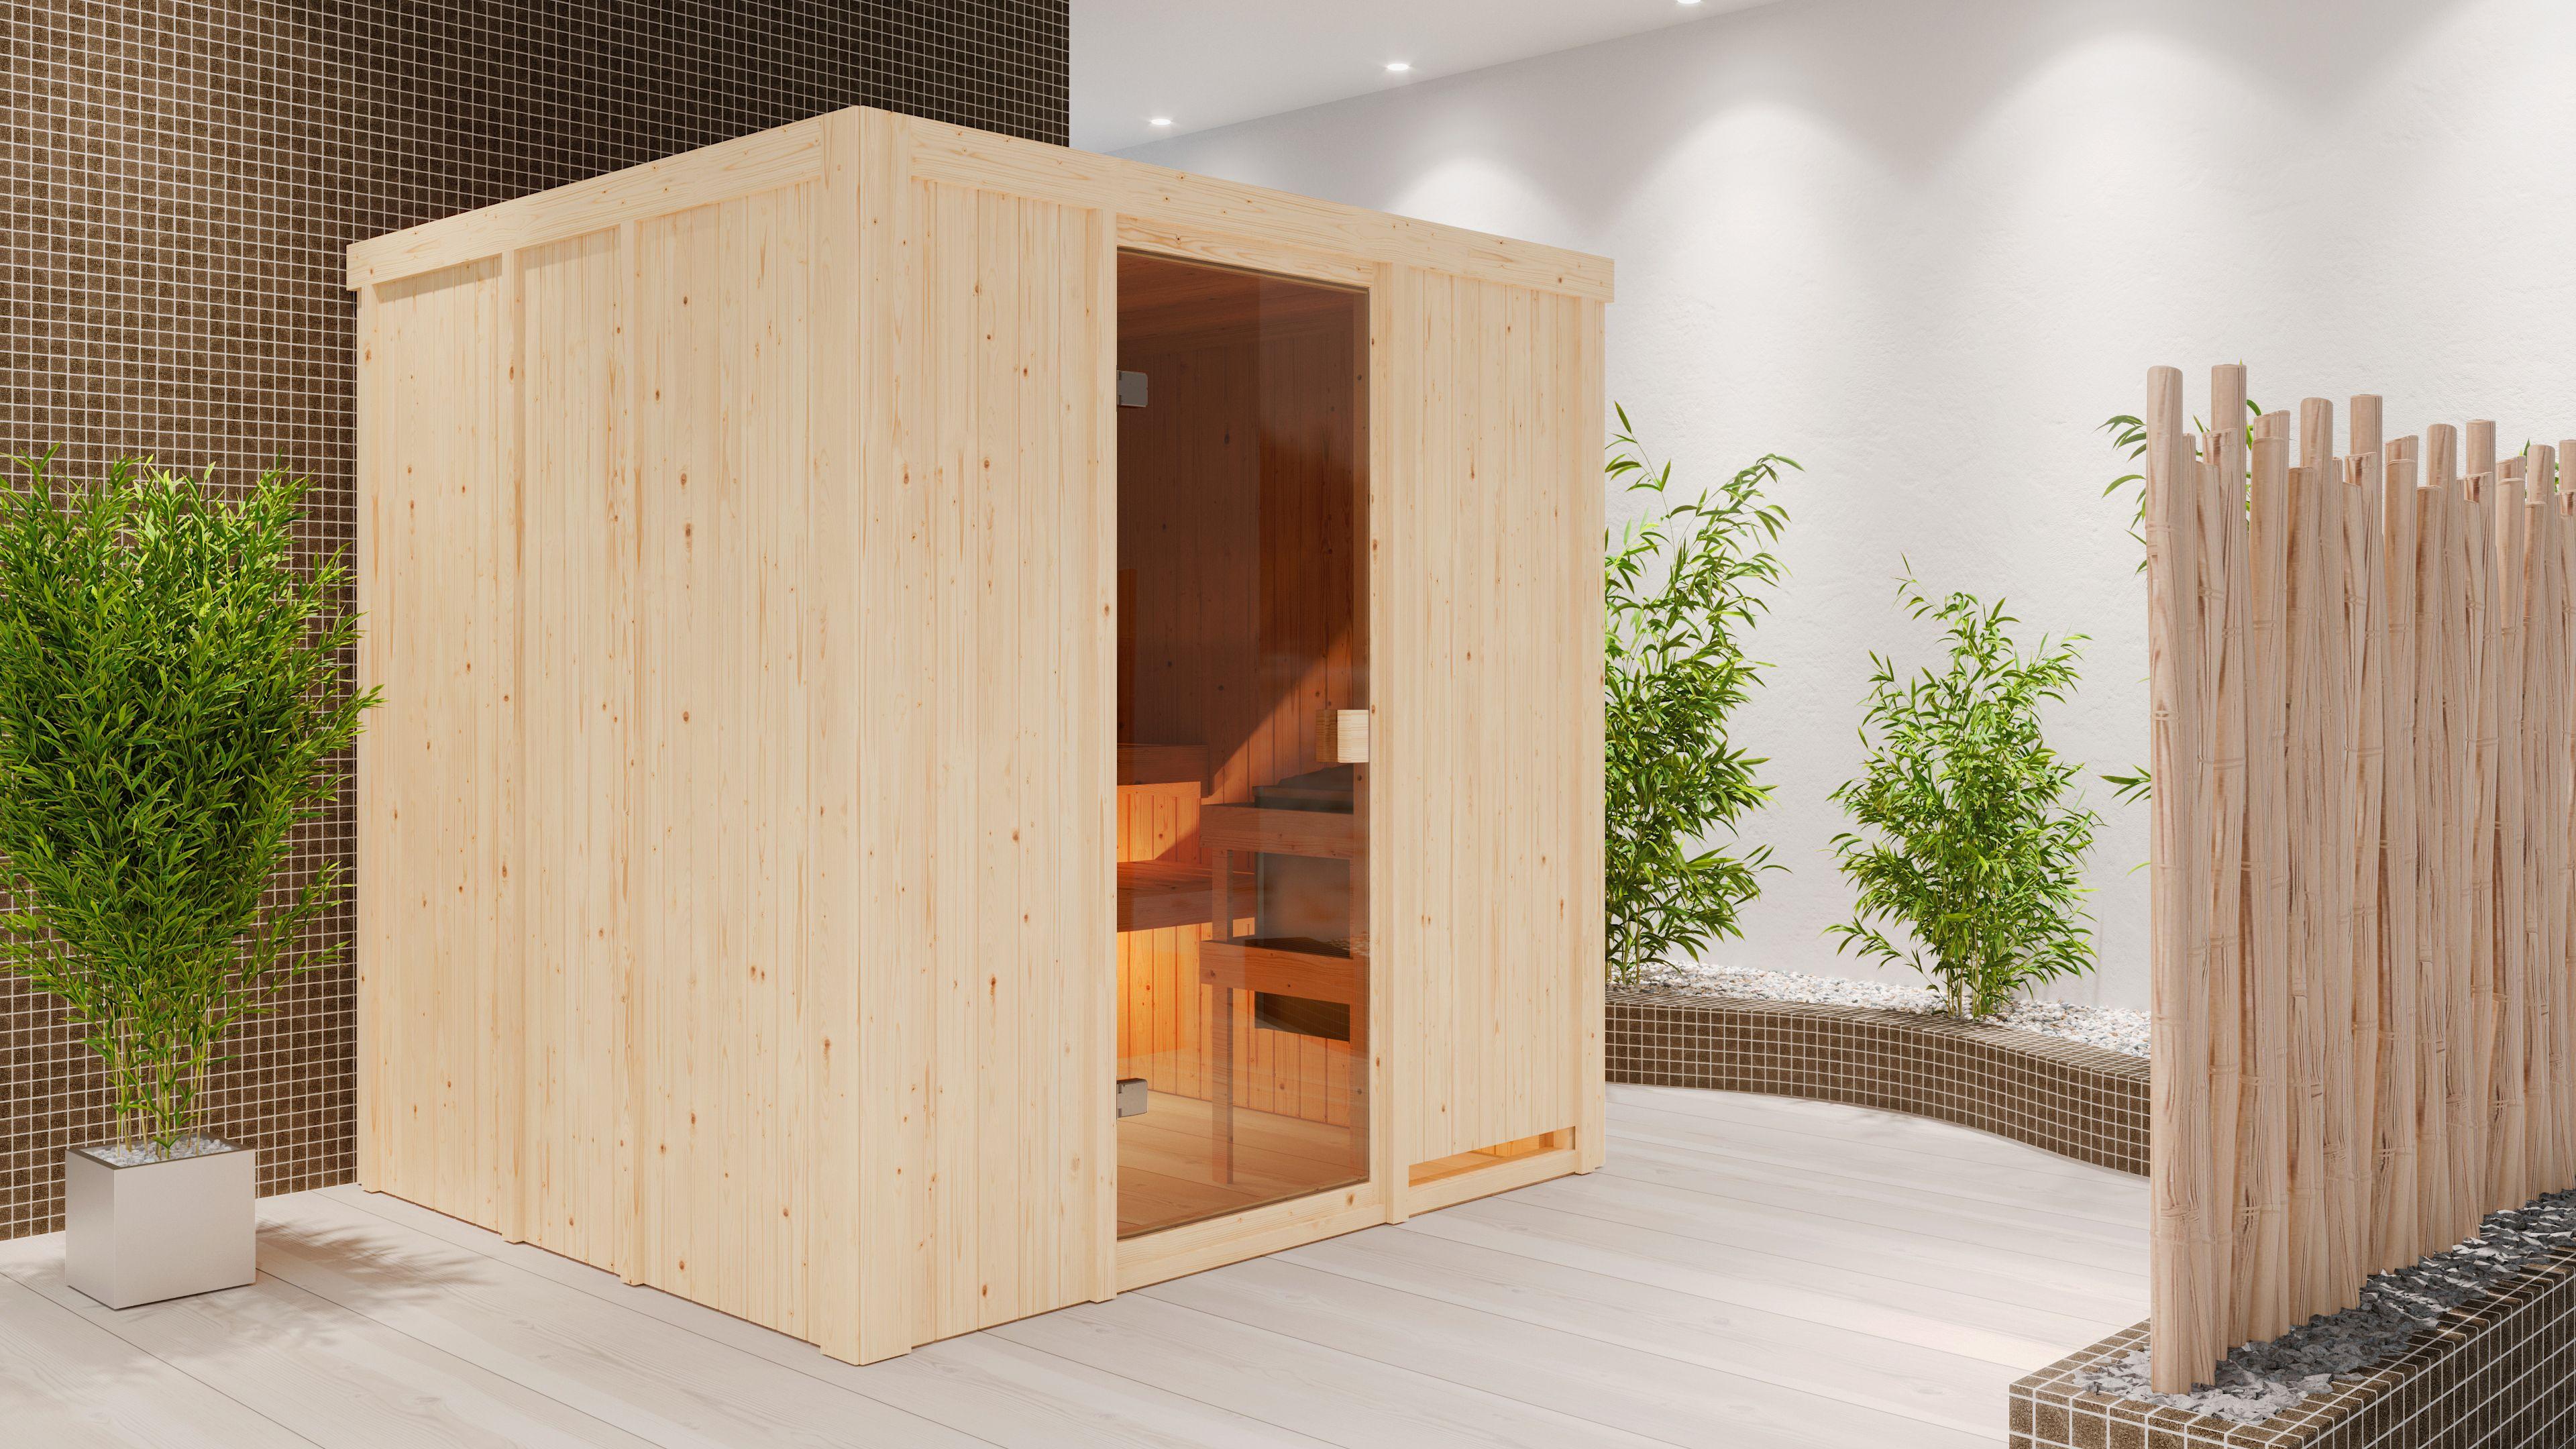 Woodfeeling Sauna Tromsö 68mm ohne Saunaofen Bild 6